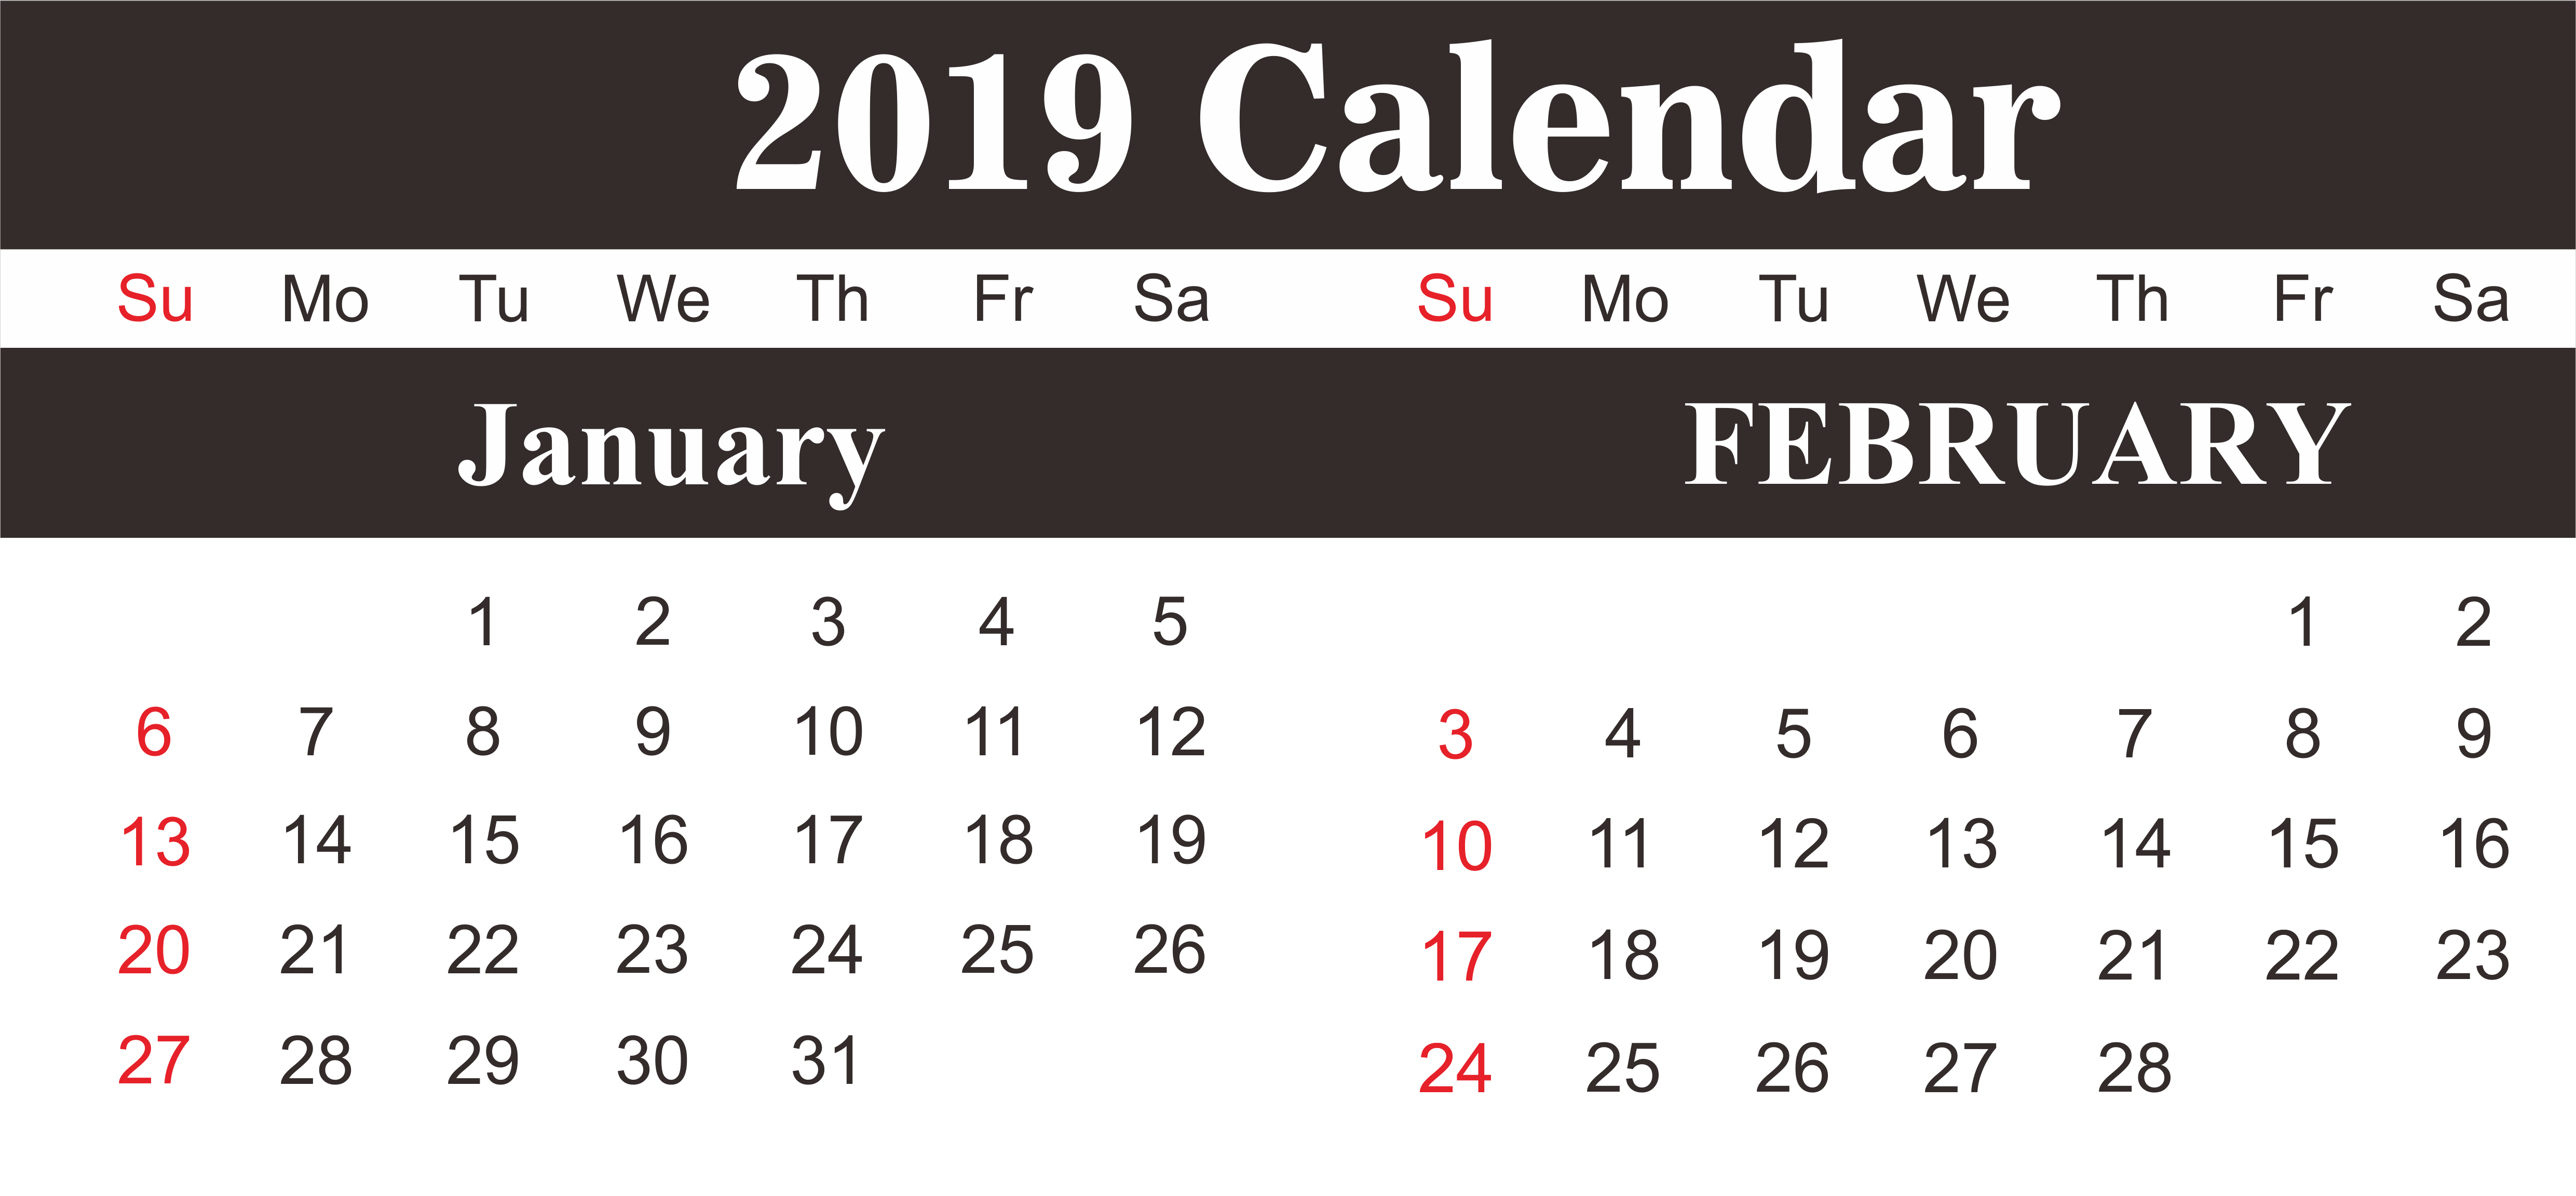 January February 2019 Calendar